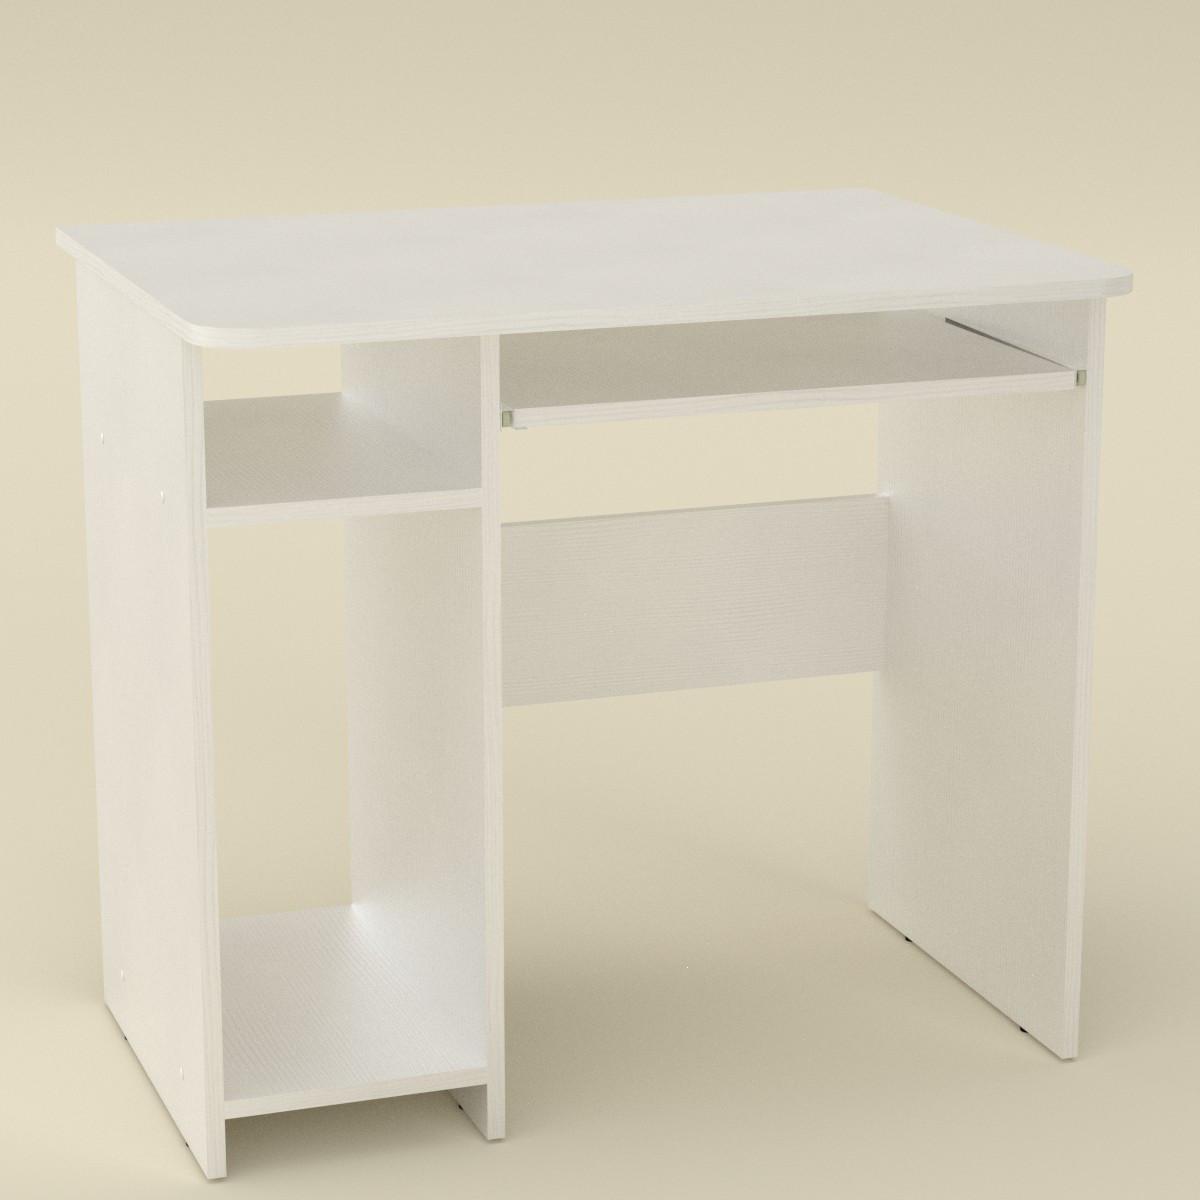 Стол компьютерный СКМ-12 белый Компанит (82х60х74 см), фото 1